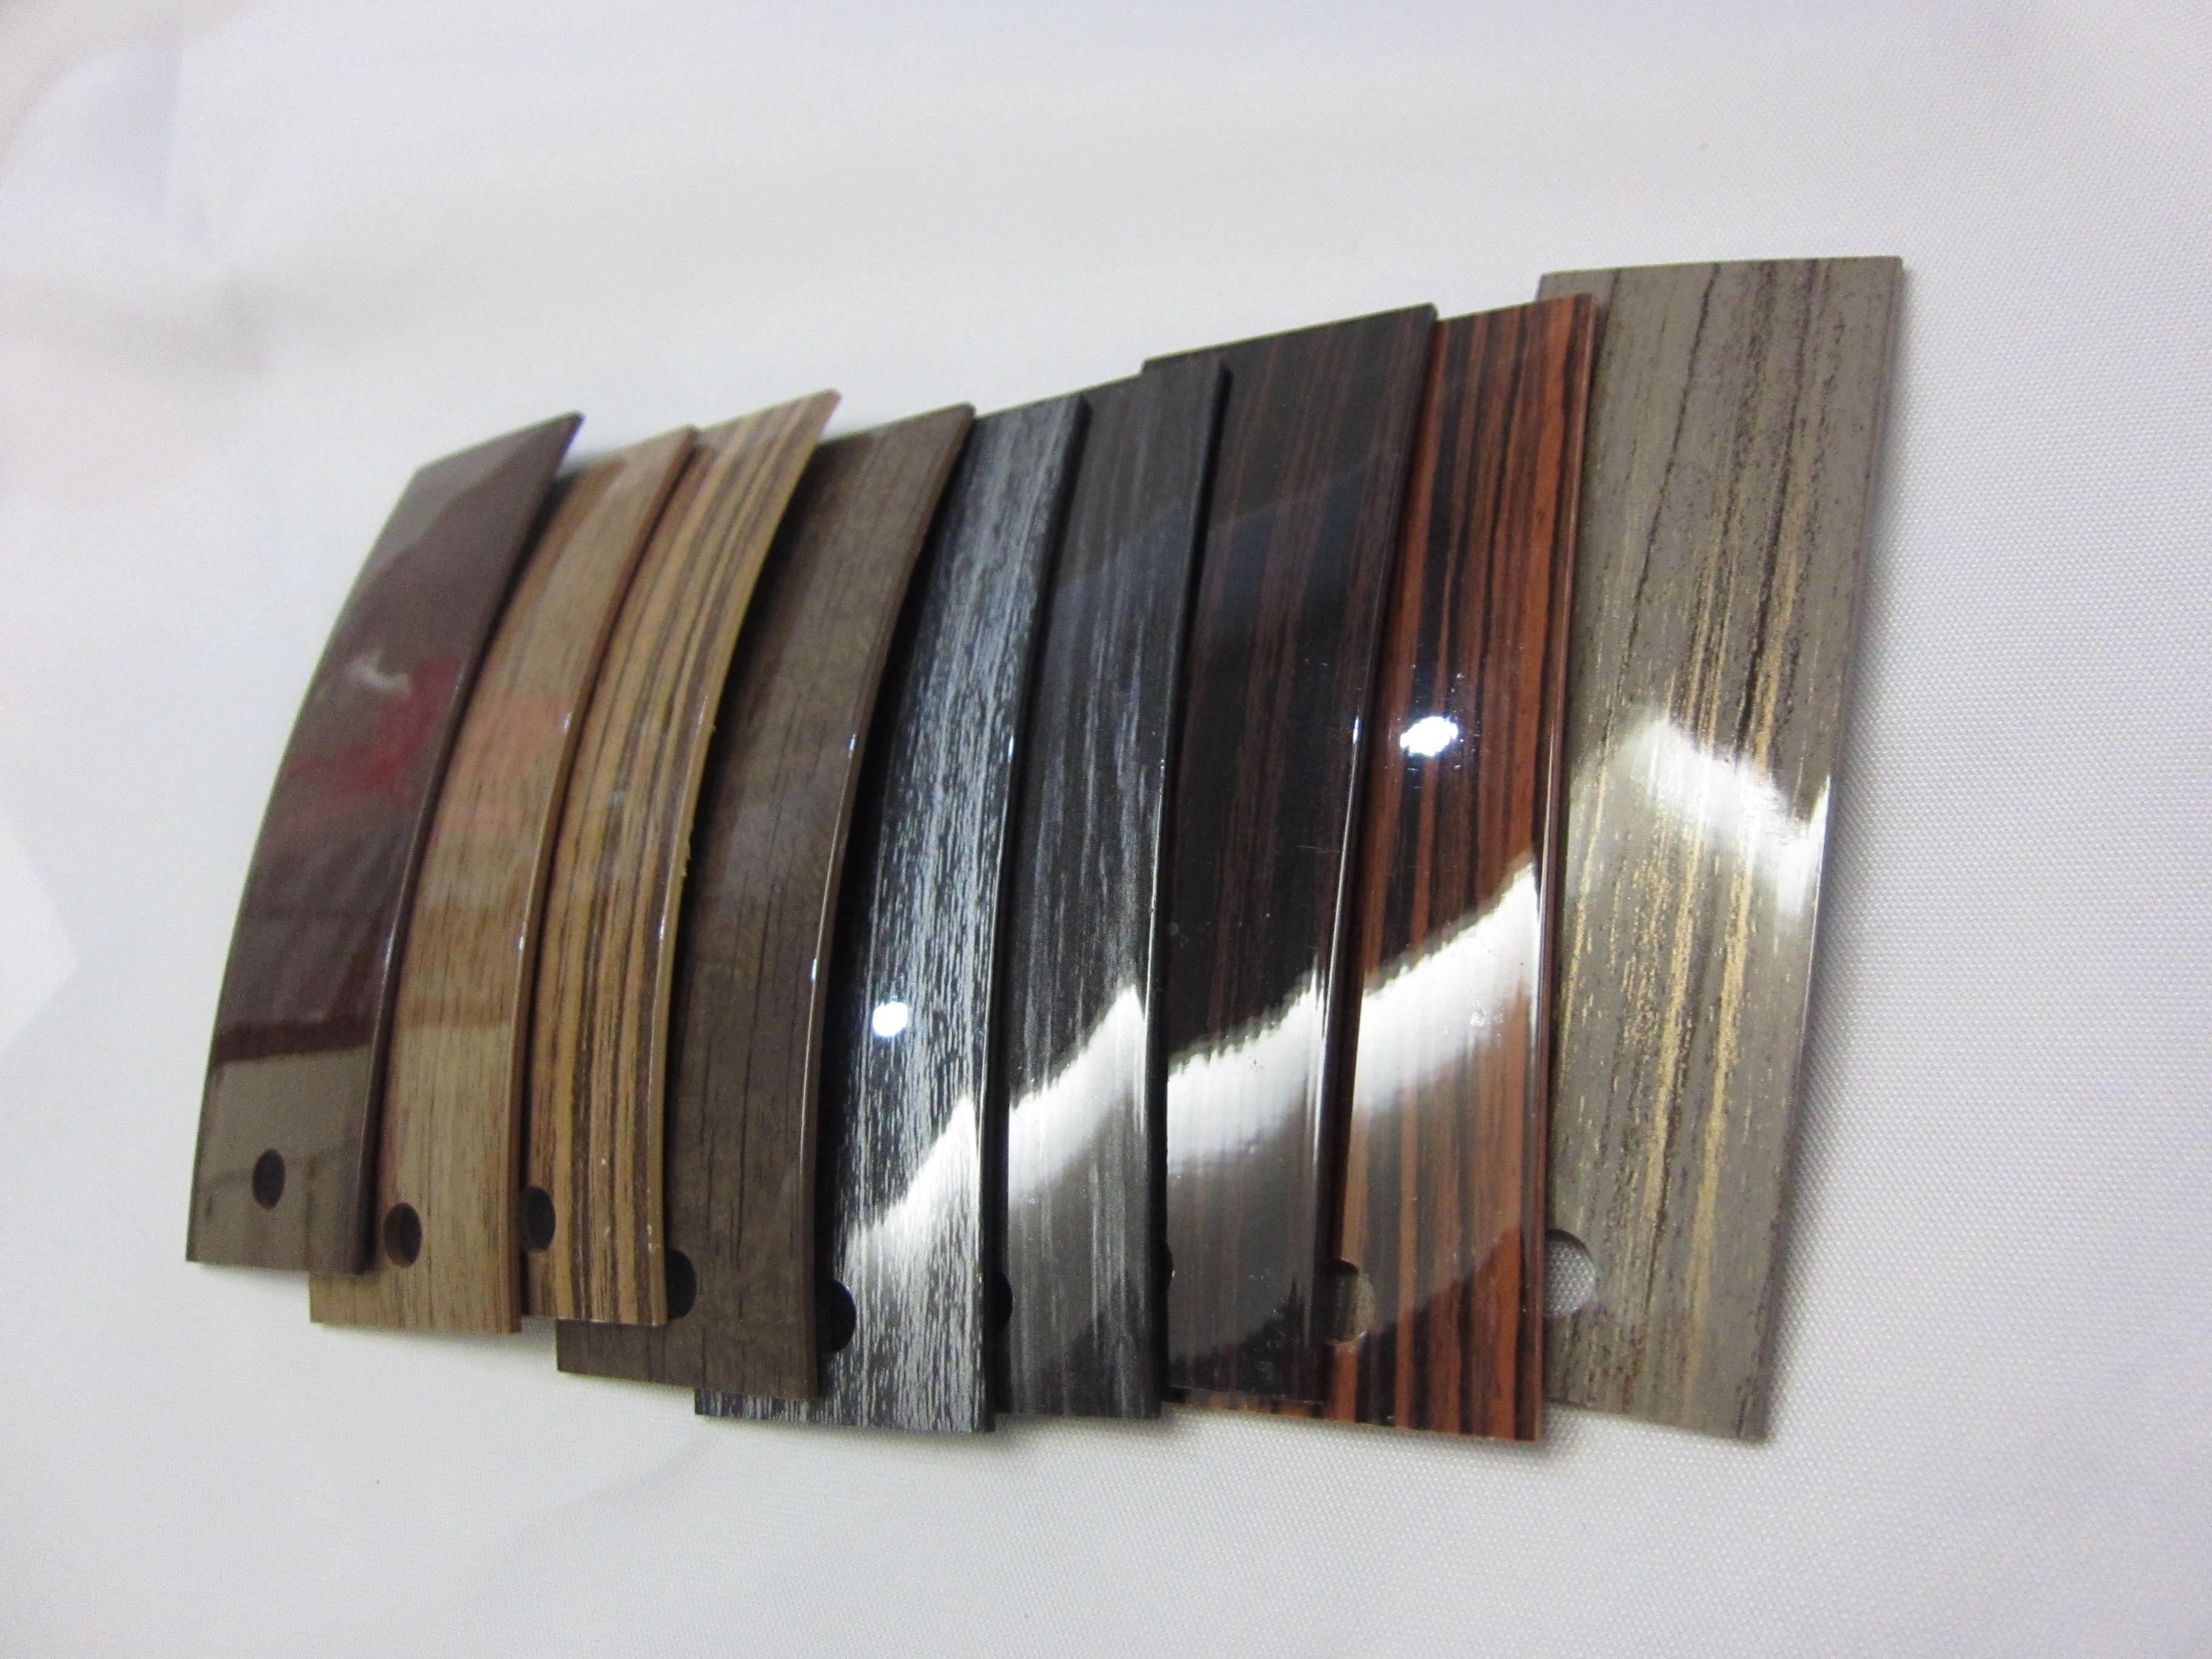 High Gloss Wood Grain Pvc Edge Banding High Highgloss Woodgrain Pvcedgebanding Email Hs07 Edginghengsu Com Wood Grain Leather Bracelet High Gloss